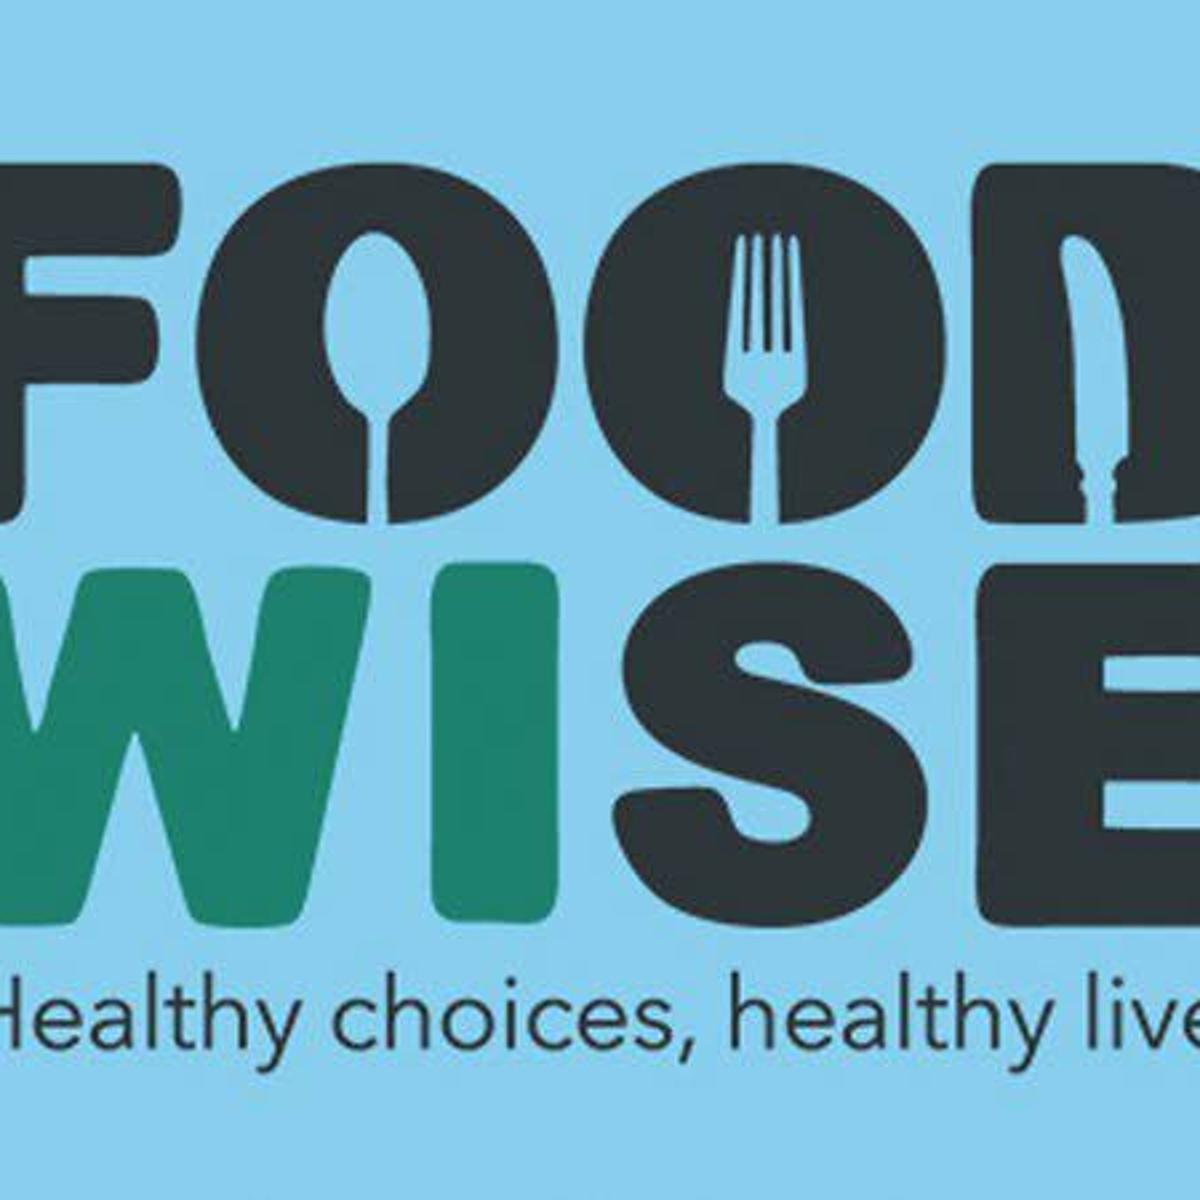 Wisconsin nutrition ed program gets new